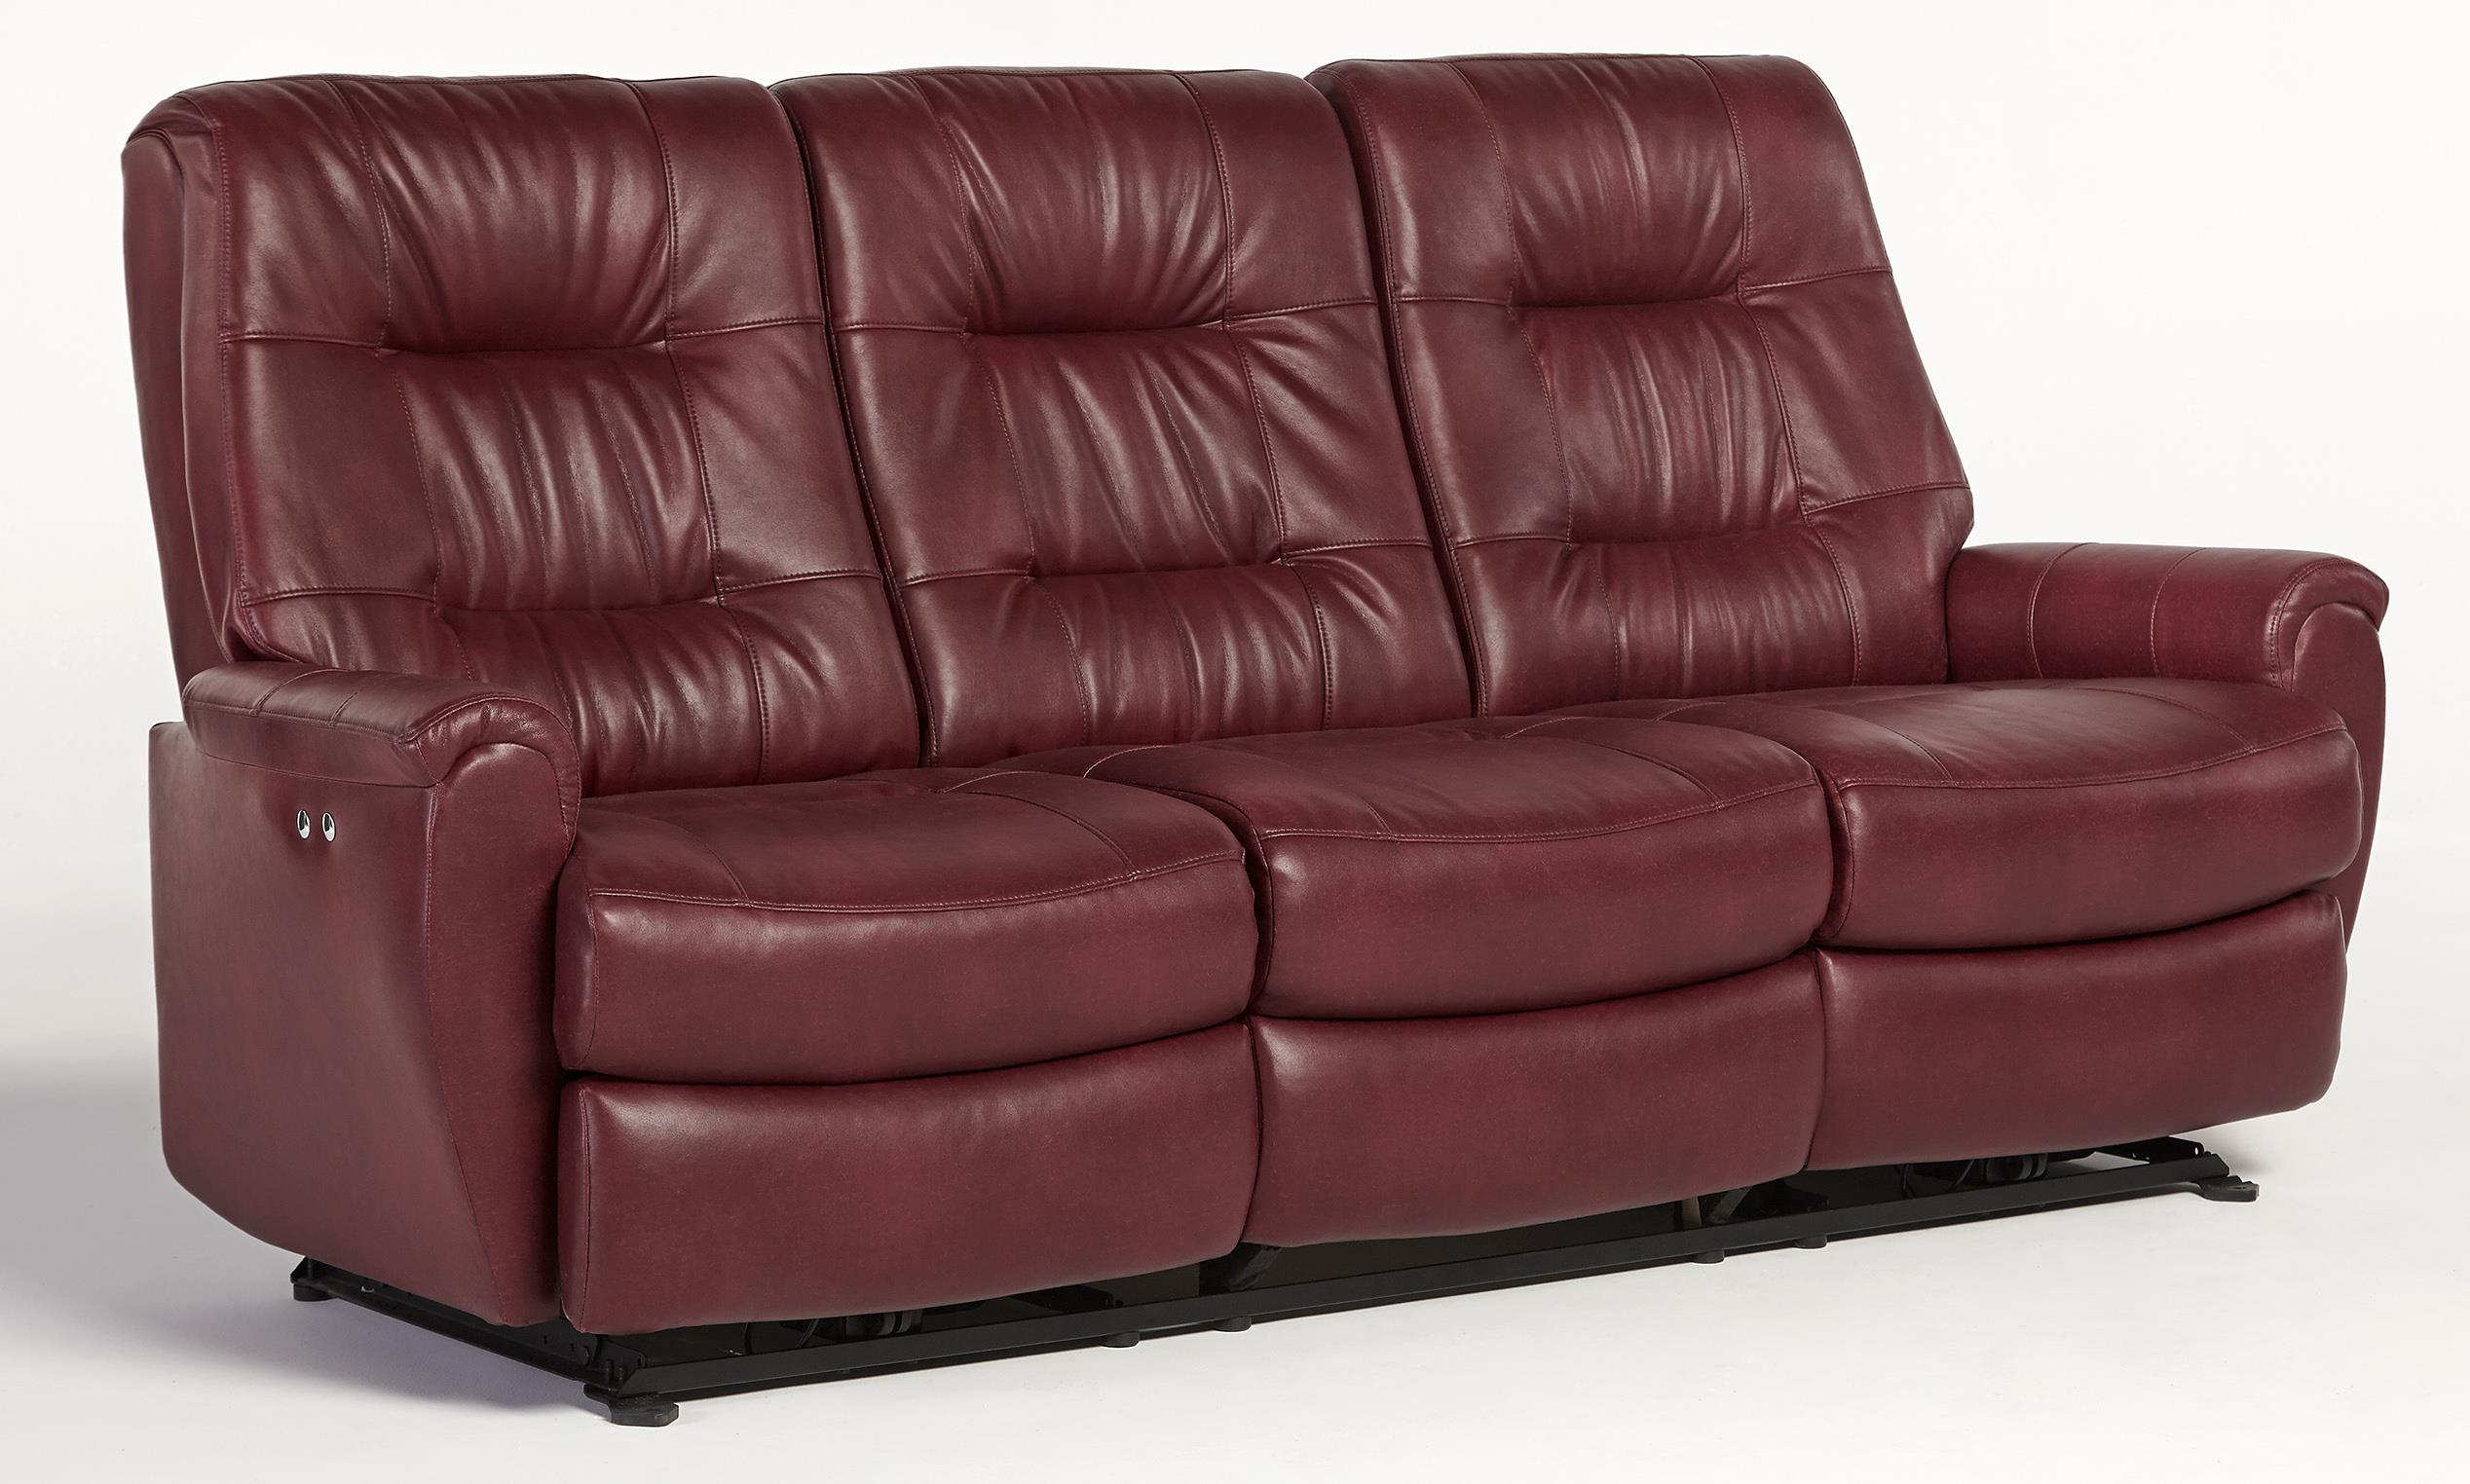 Best Home Furnishings Felicia  Reclining Sofa - Item Number: S270UA4-26738U